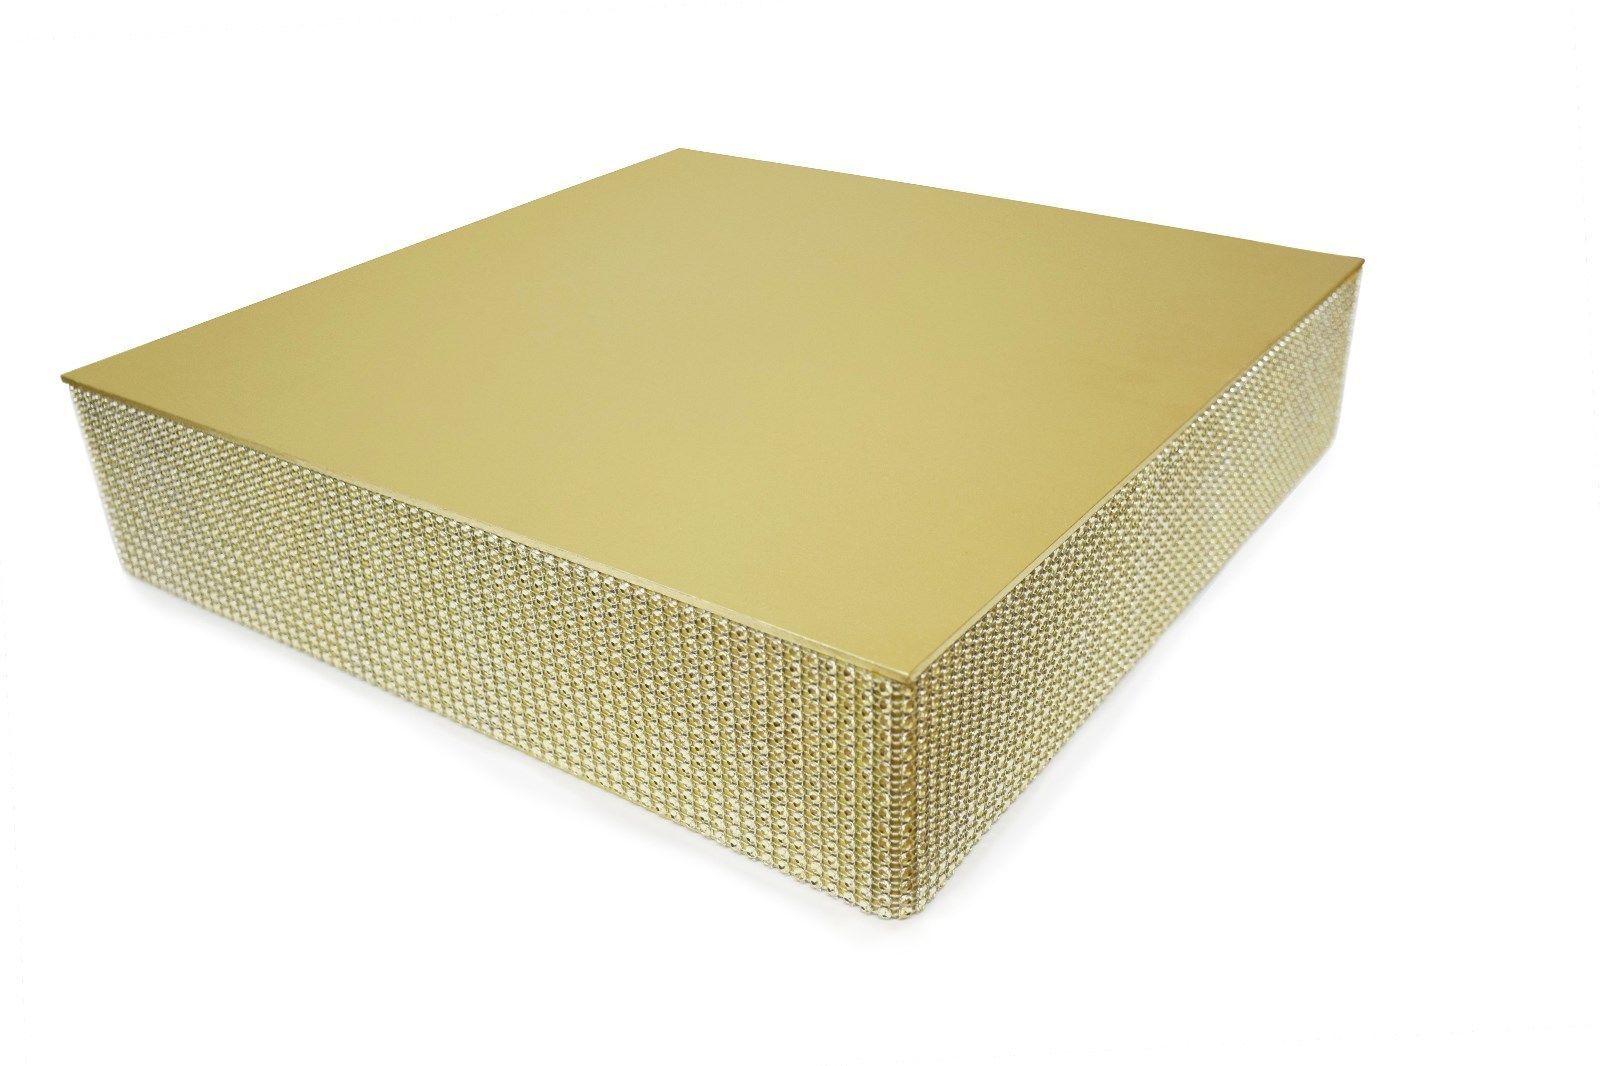 Square Round Wedding Cake Stand Silver Gold Rhinestone